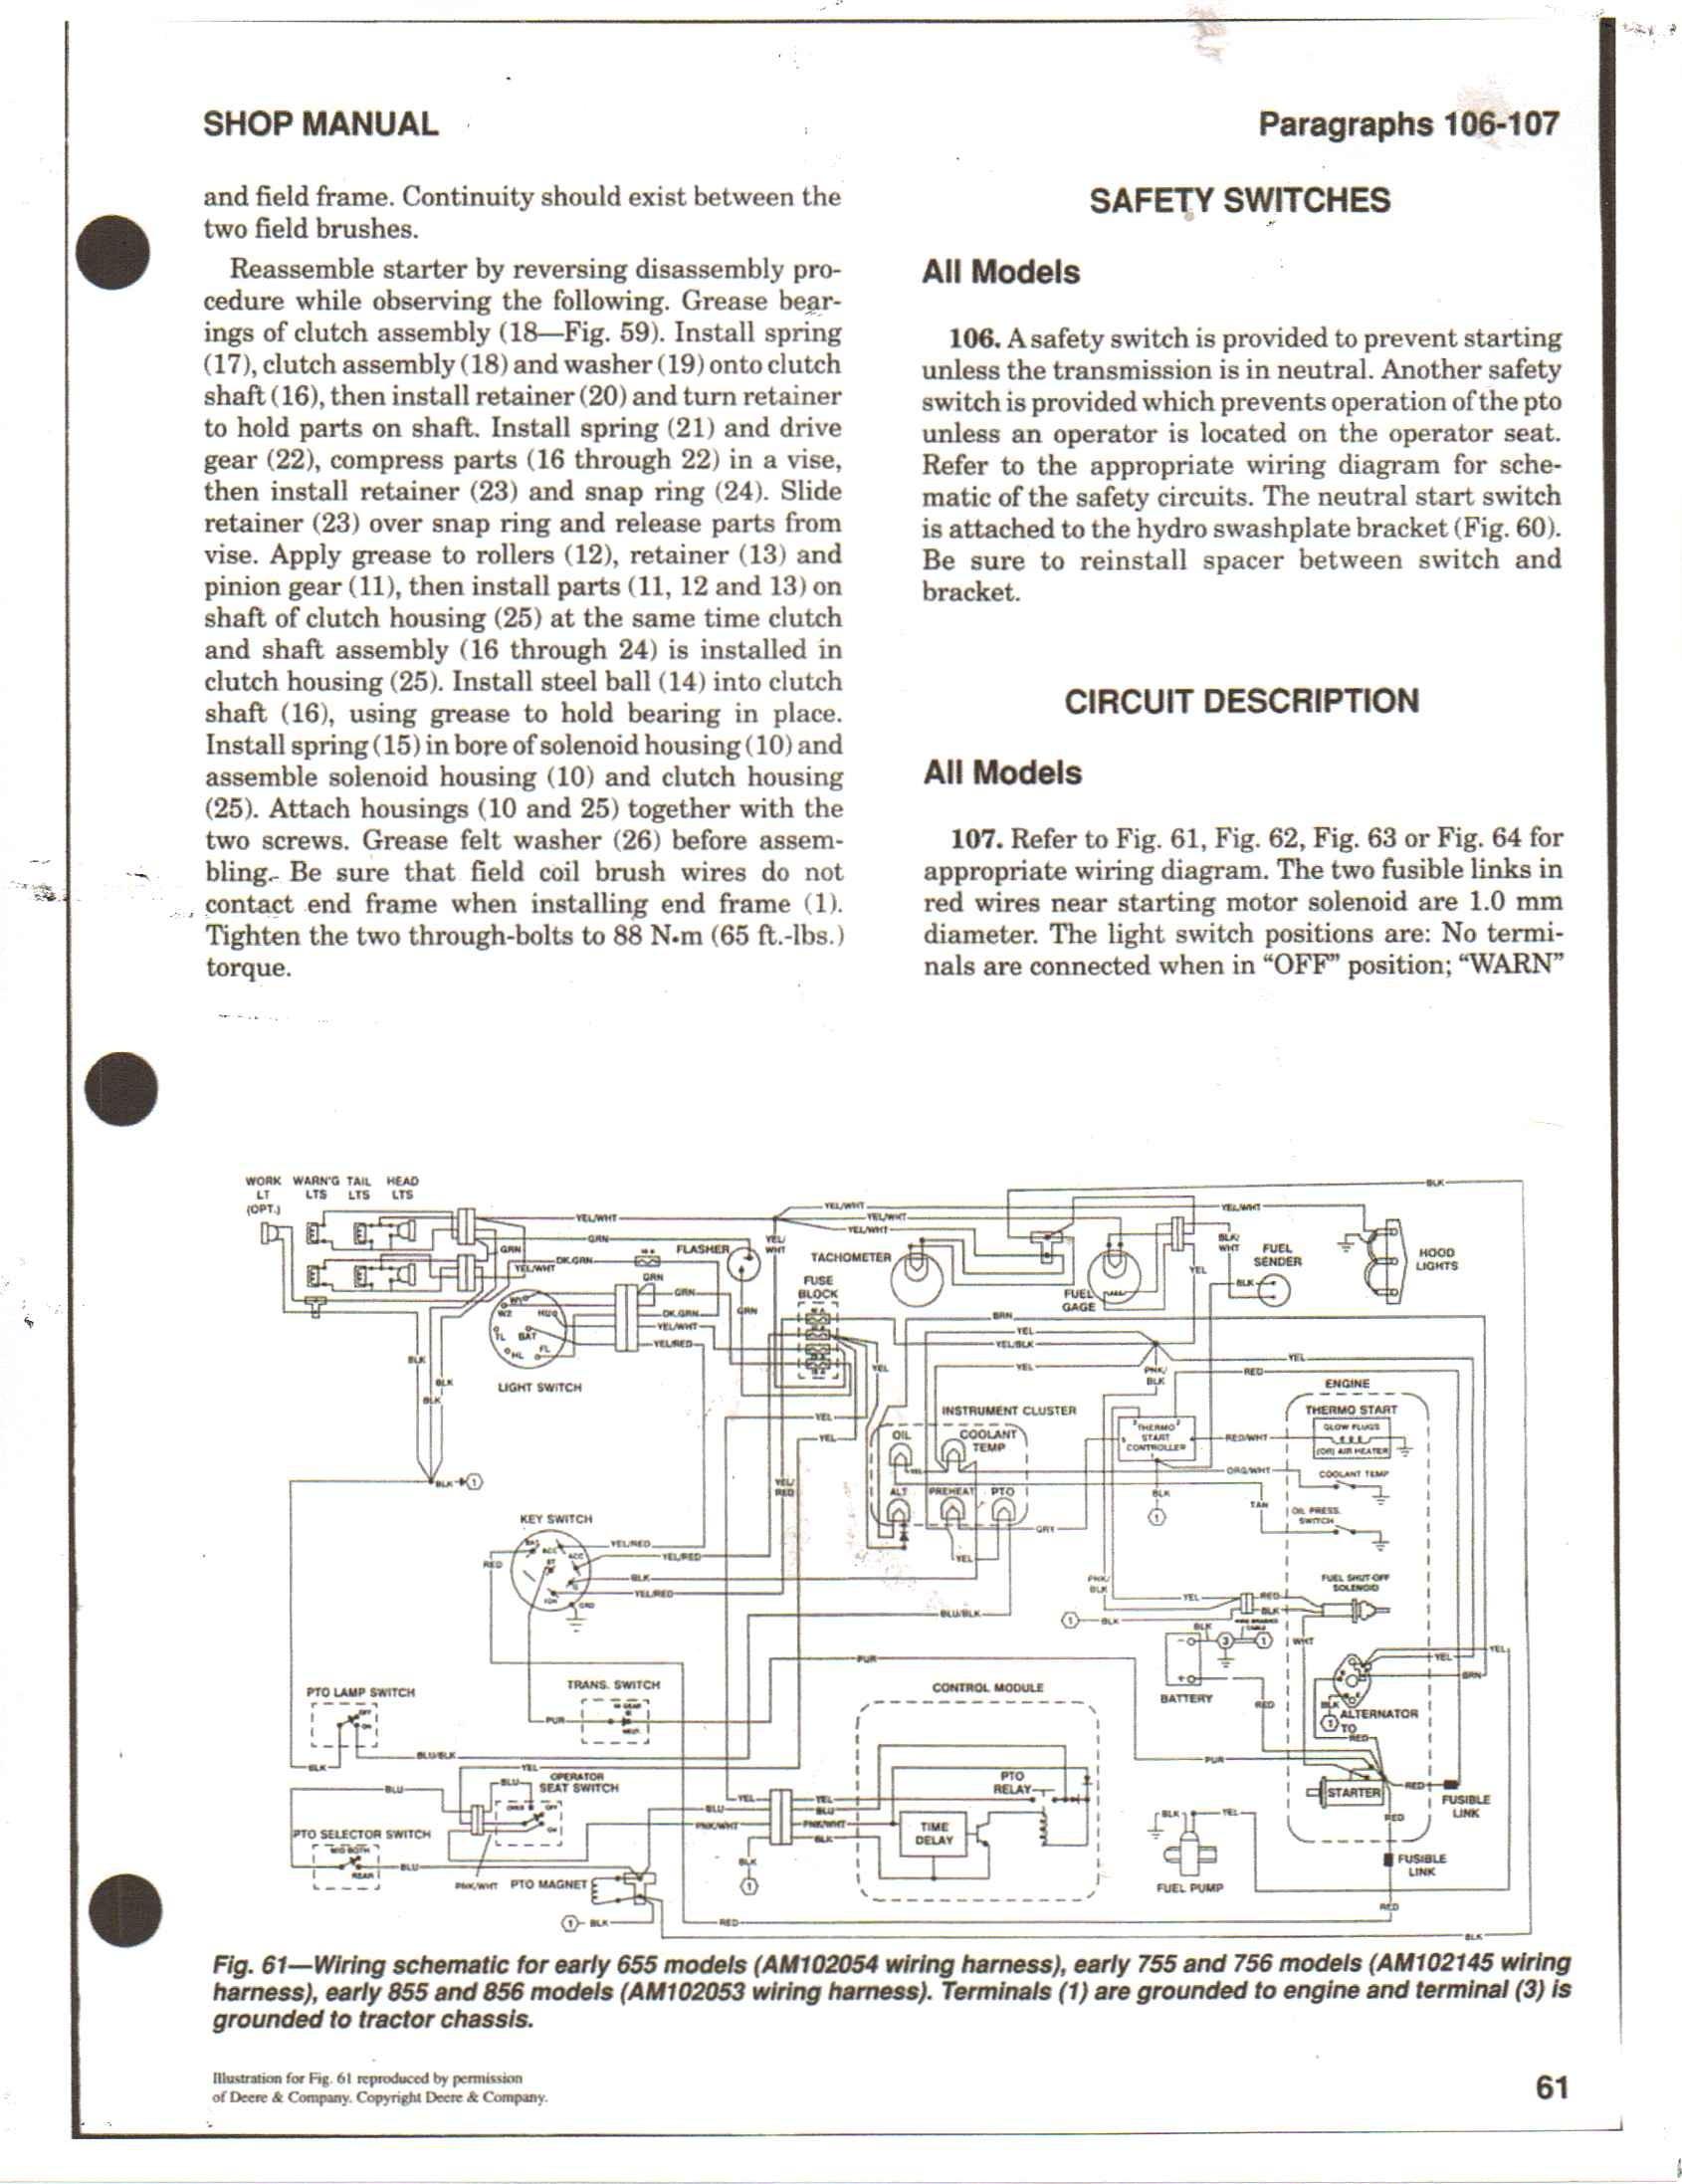 John Deere Gx345 Electrical Diagrams 56d25 John Deere 655 Wiring Diagram Of John Deere Gx345 Electrical Diagrams